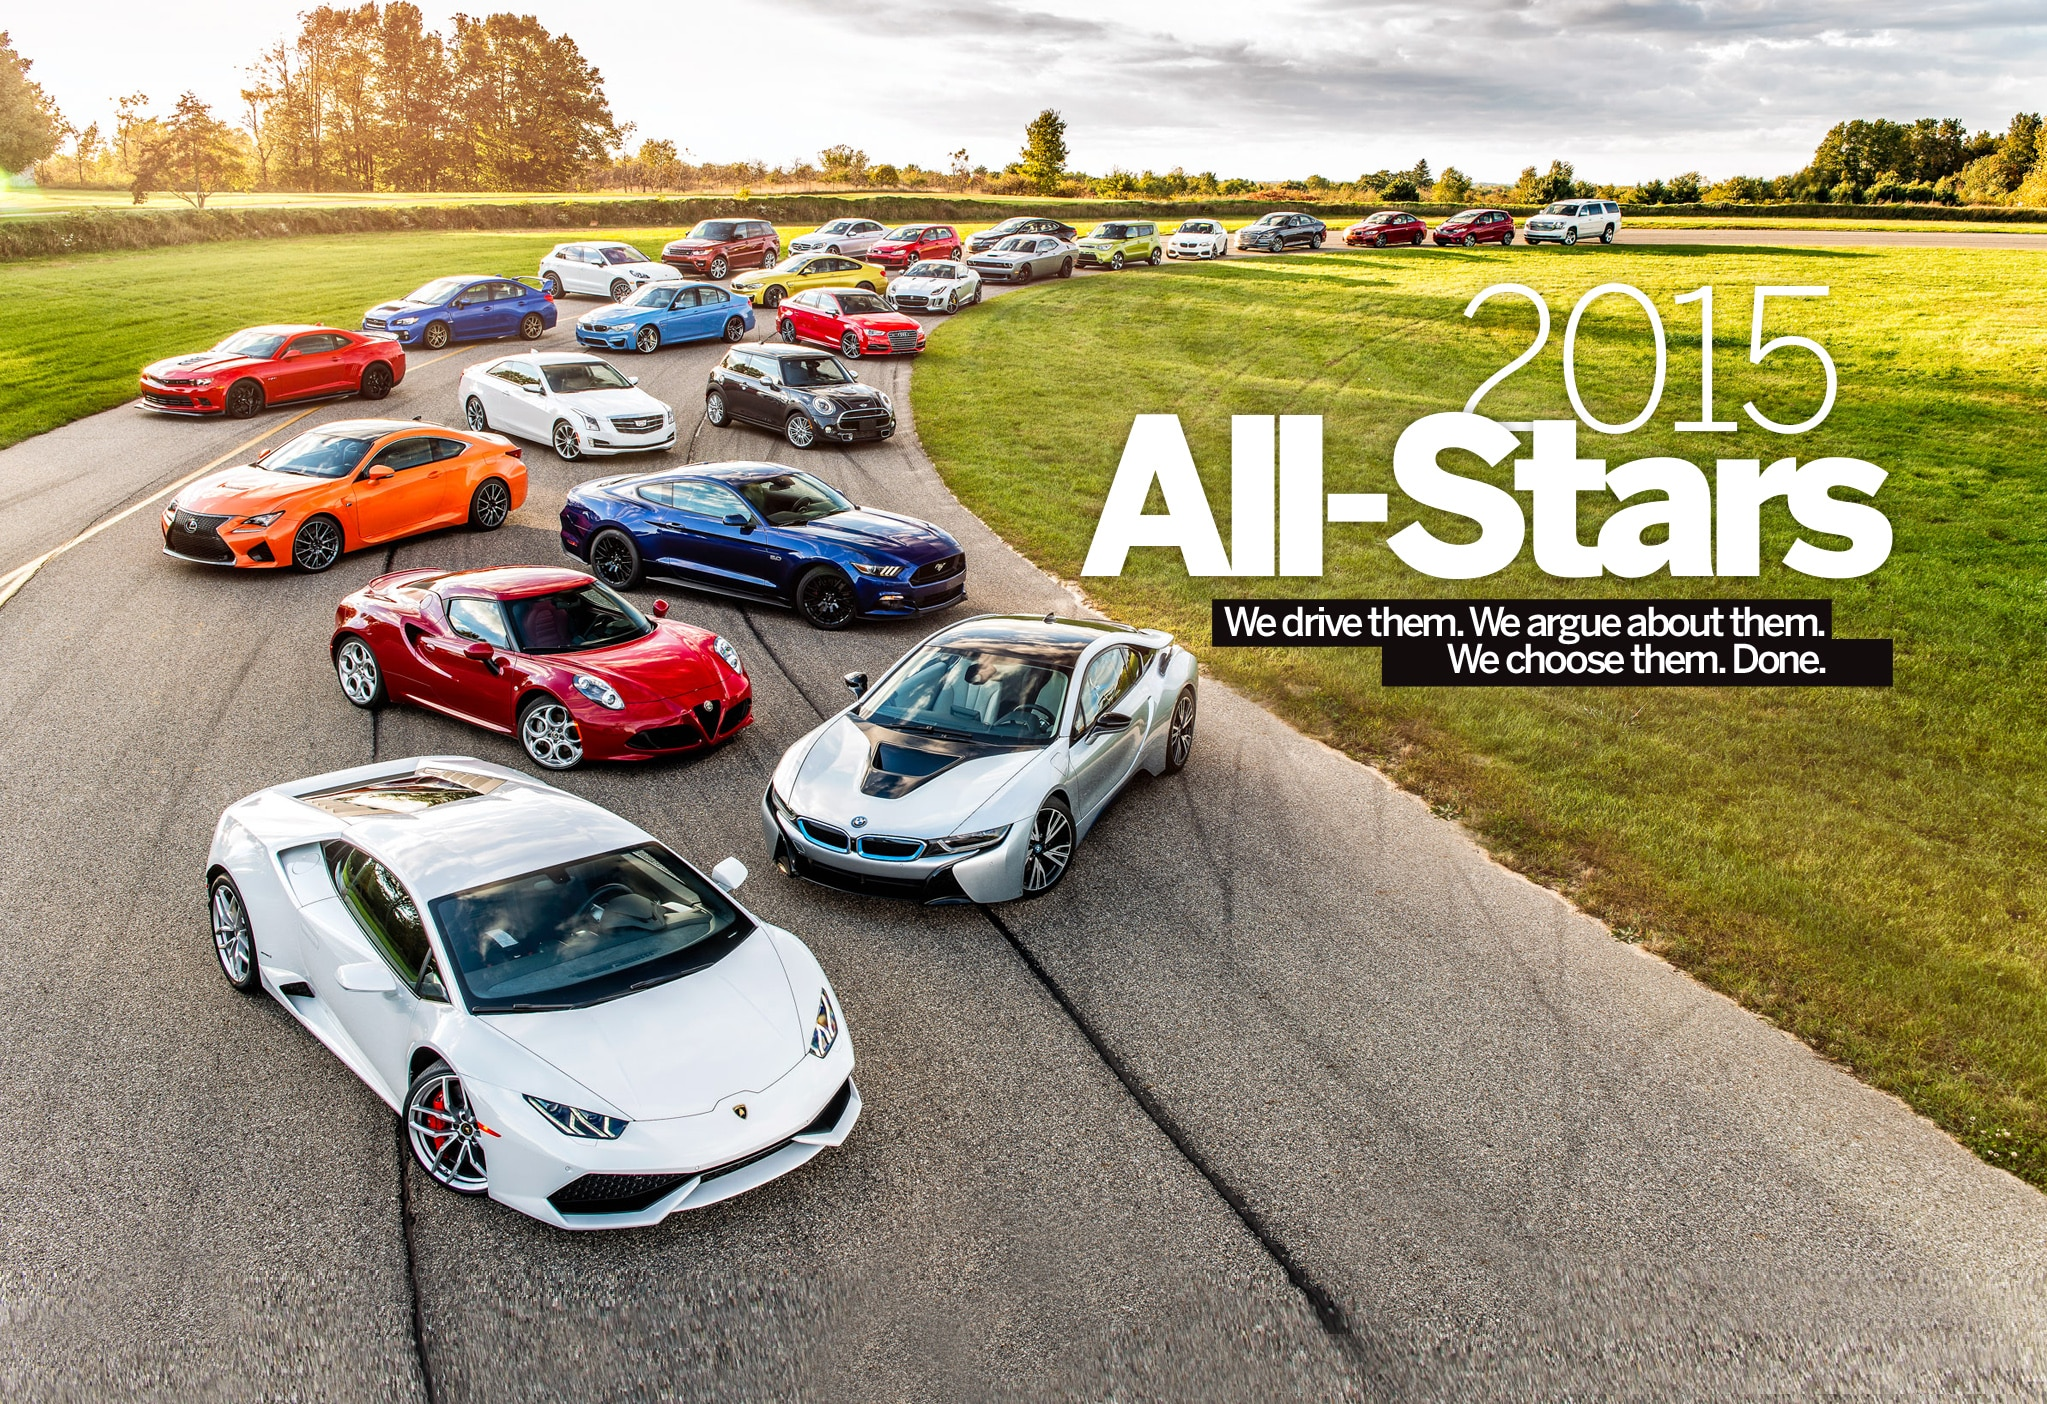 All Stars 2015 Lead